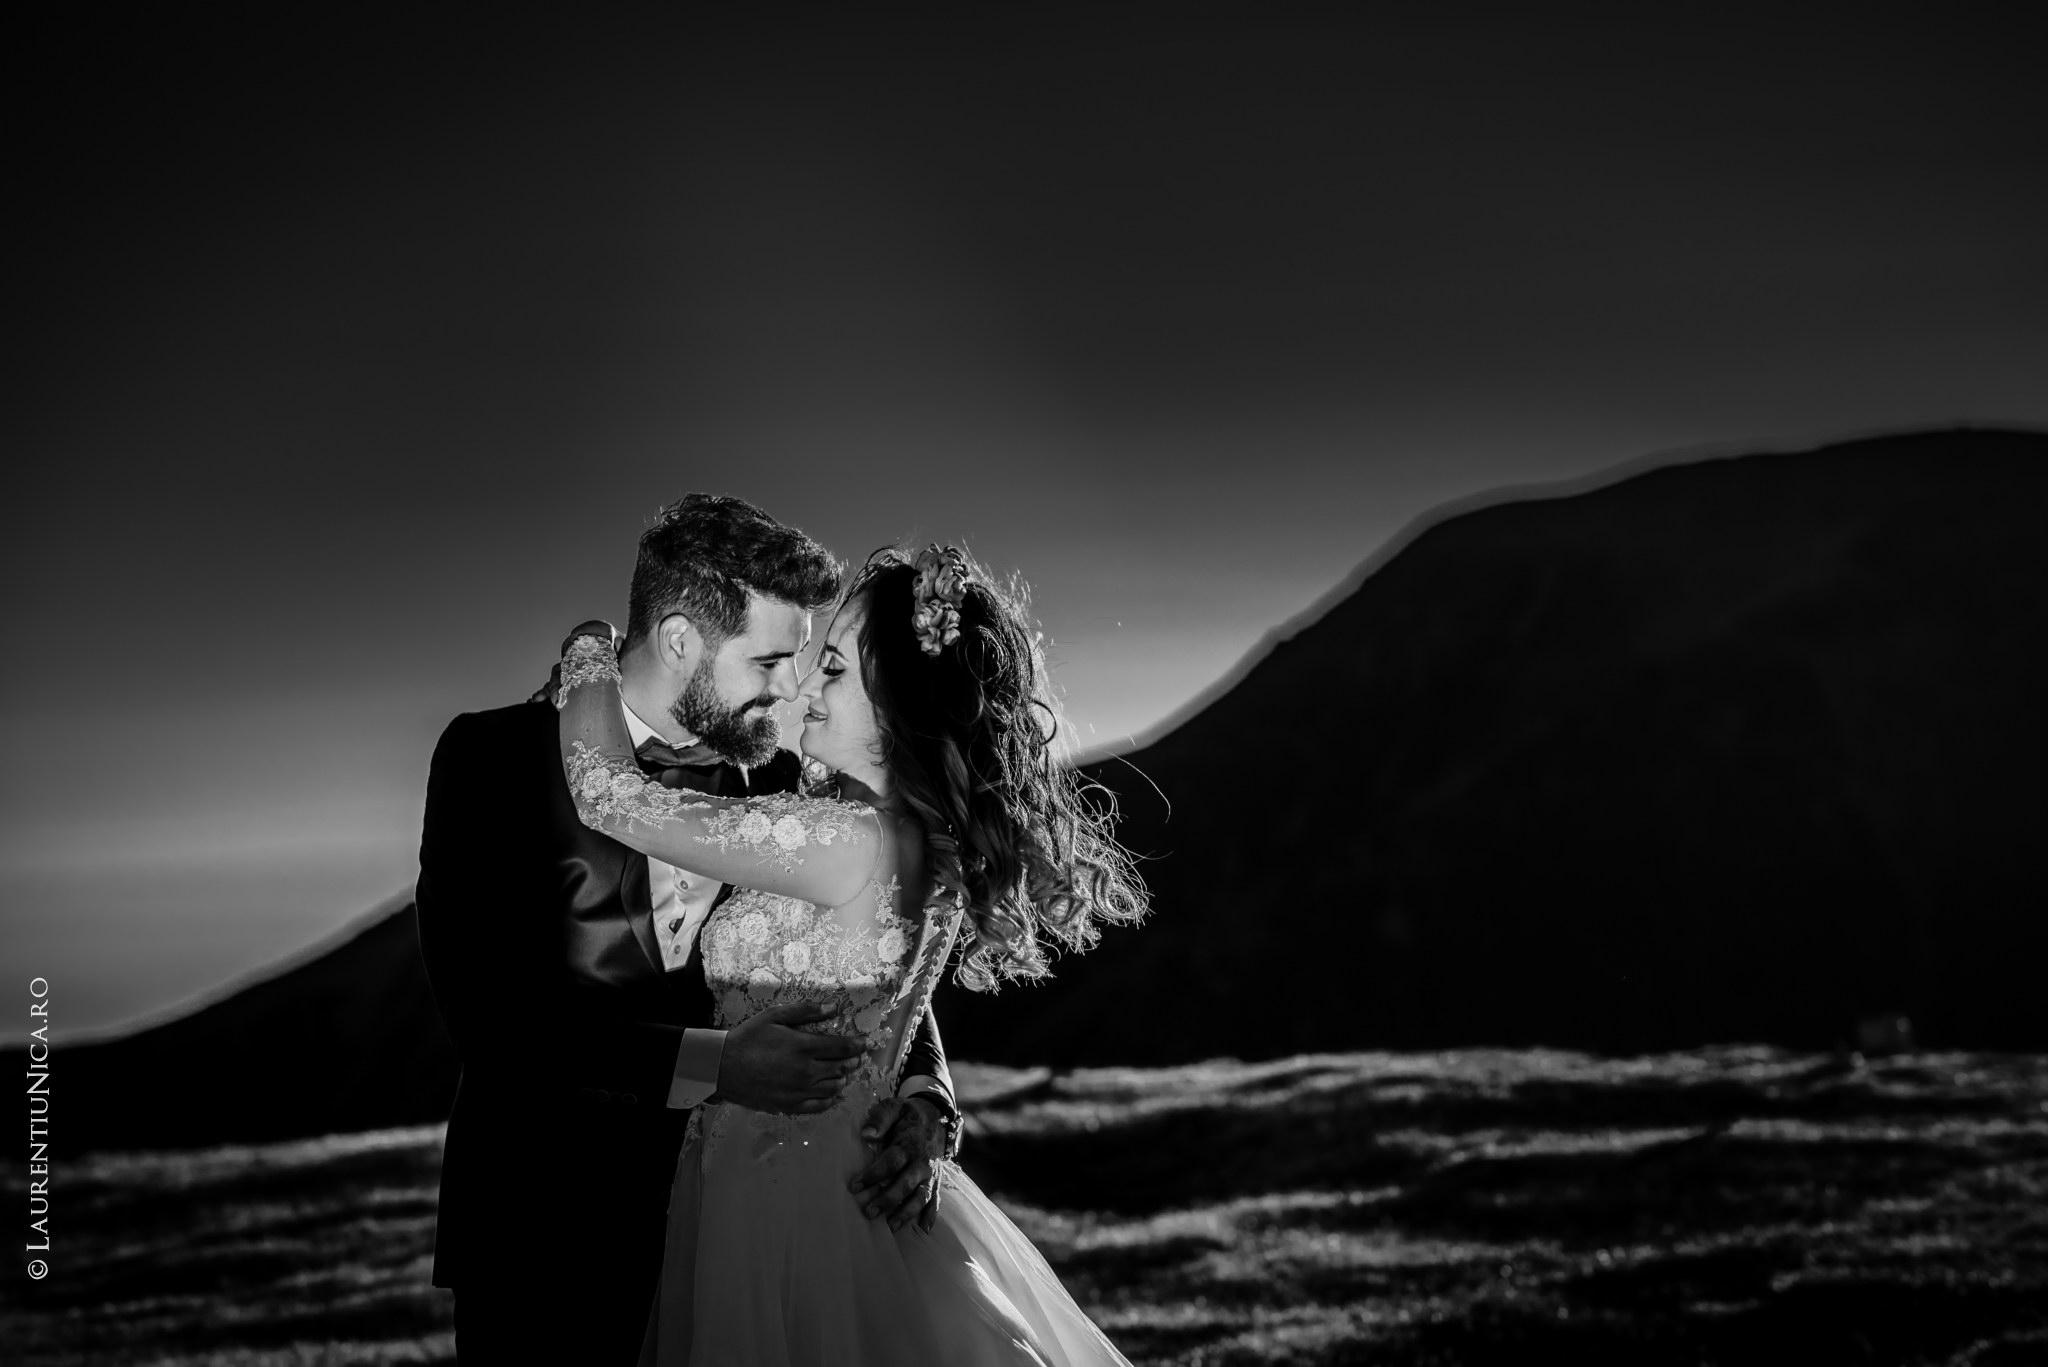 aida si alin fotograf nunta laurentiu nica transalpina 21 - Aida & Alin | Fotografii After Wedding | Transalpina - Muntii Parang